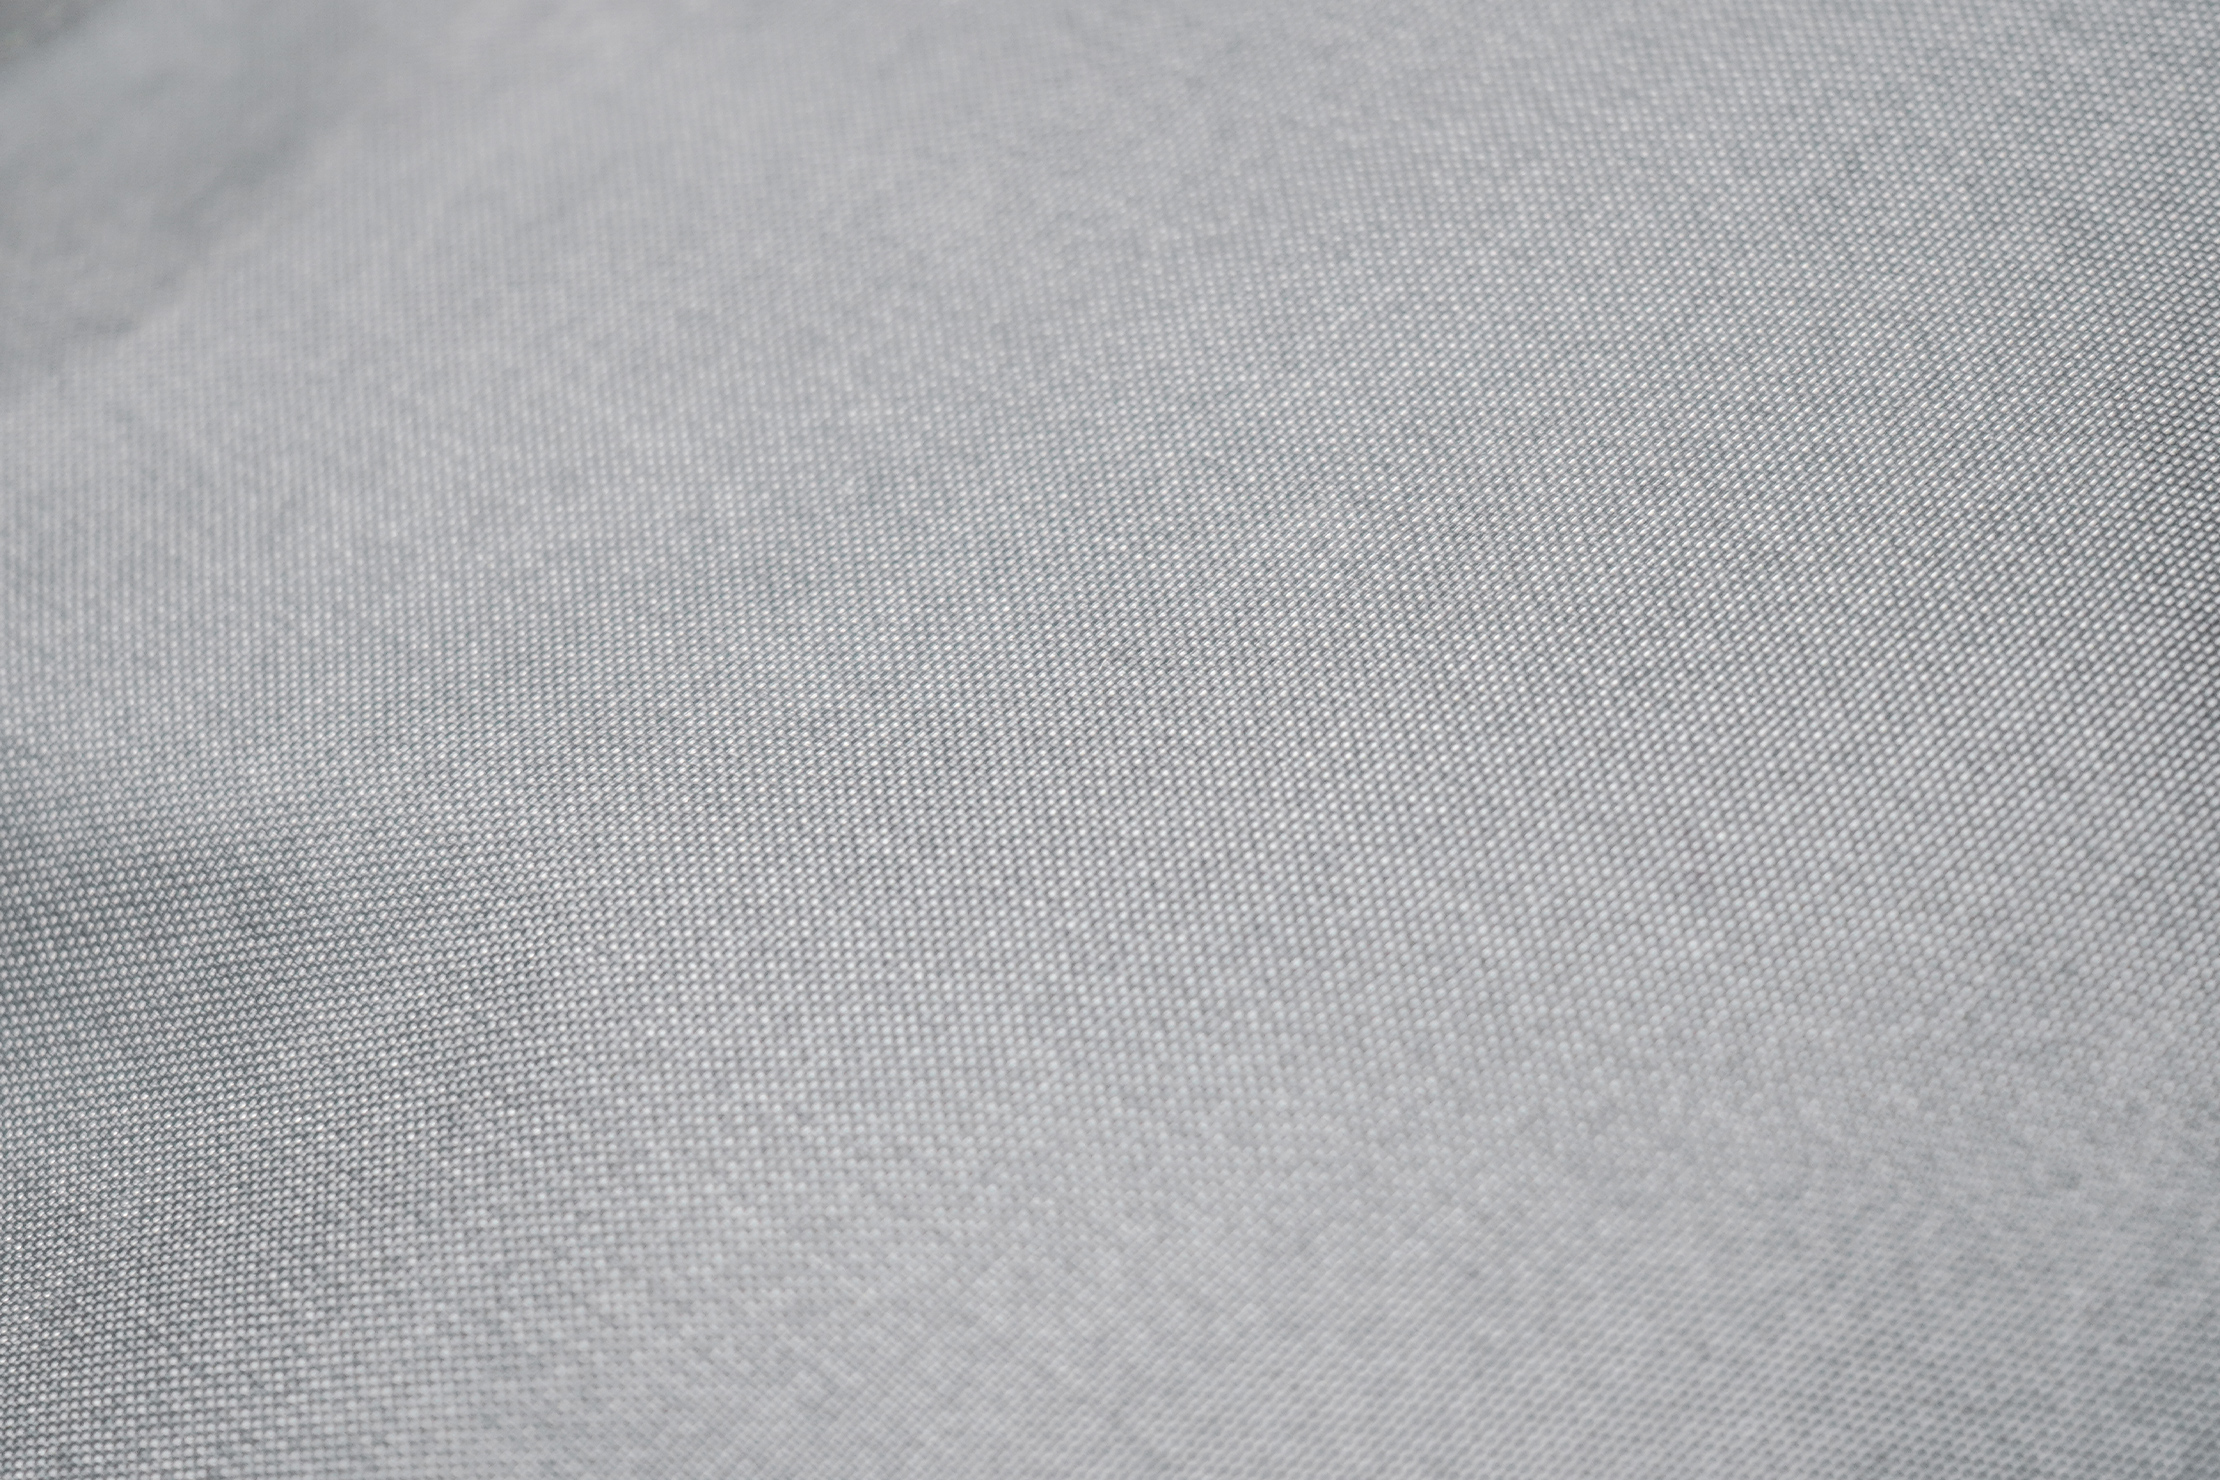 Veilance Nomin Pack (V2) Material